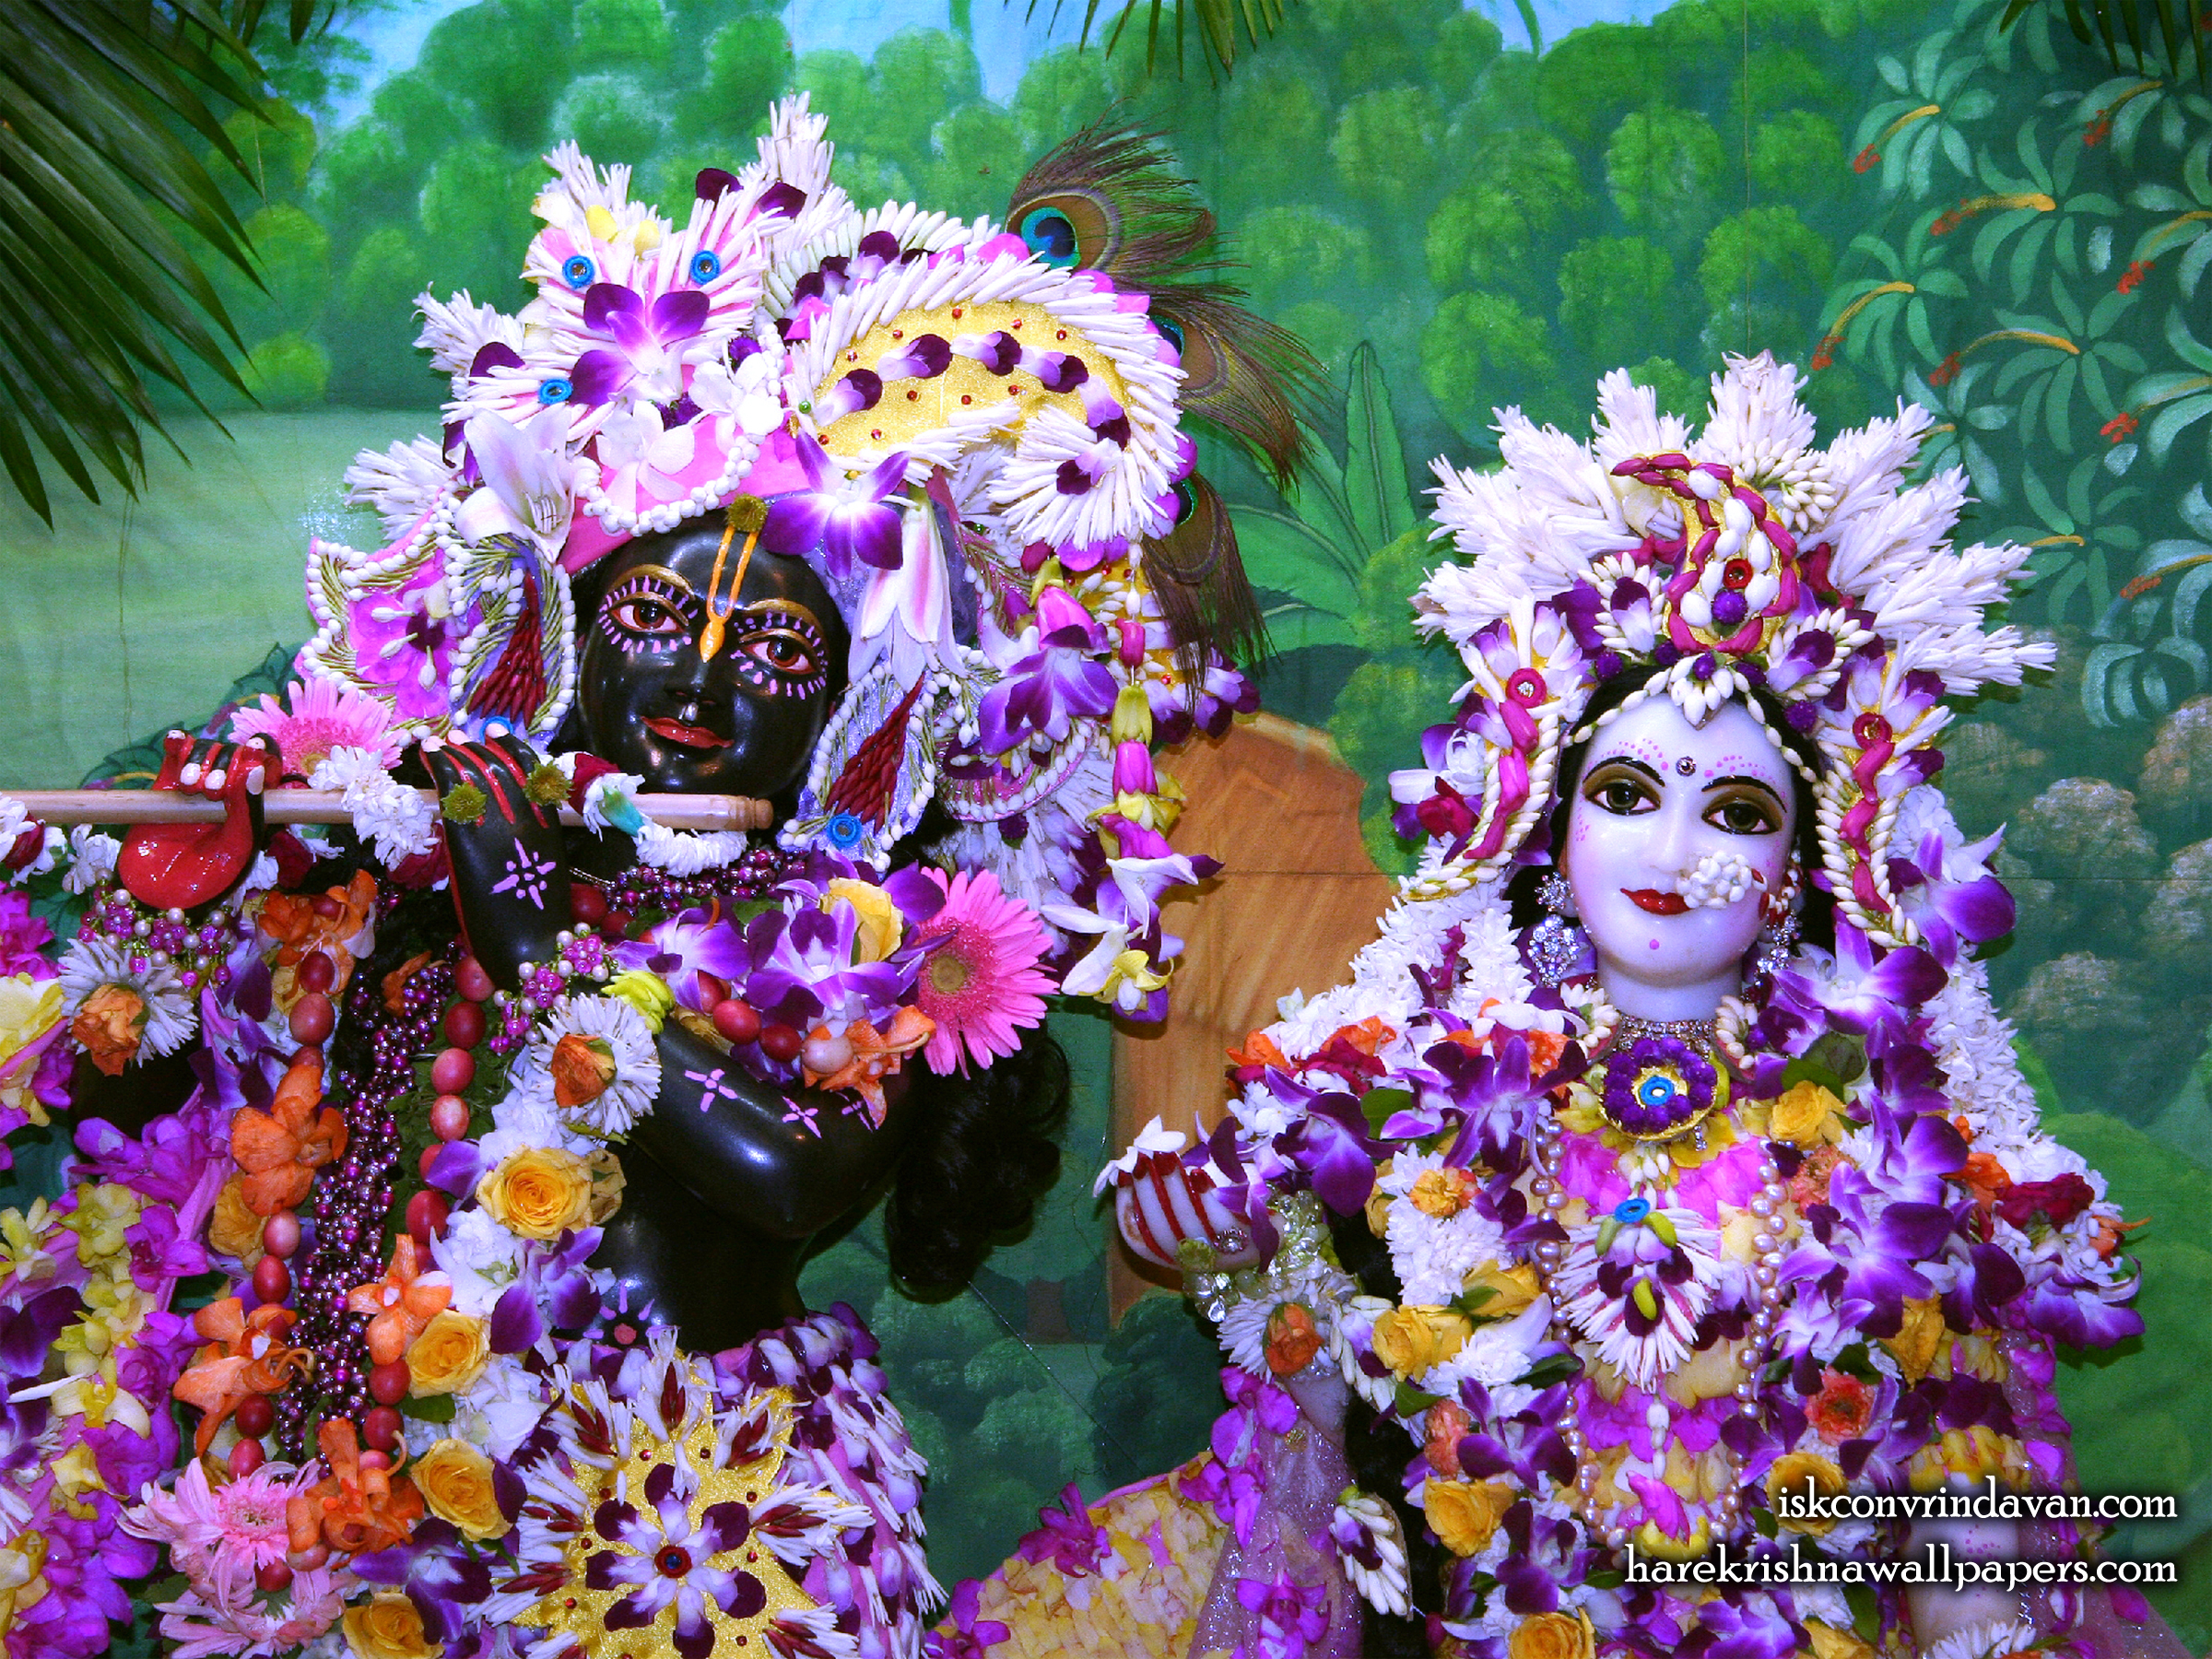 Sri Sri Radha Shyamsundar Close up Wallpaper (010) Size 2400x1800 Download